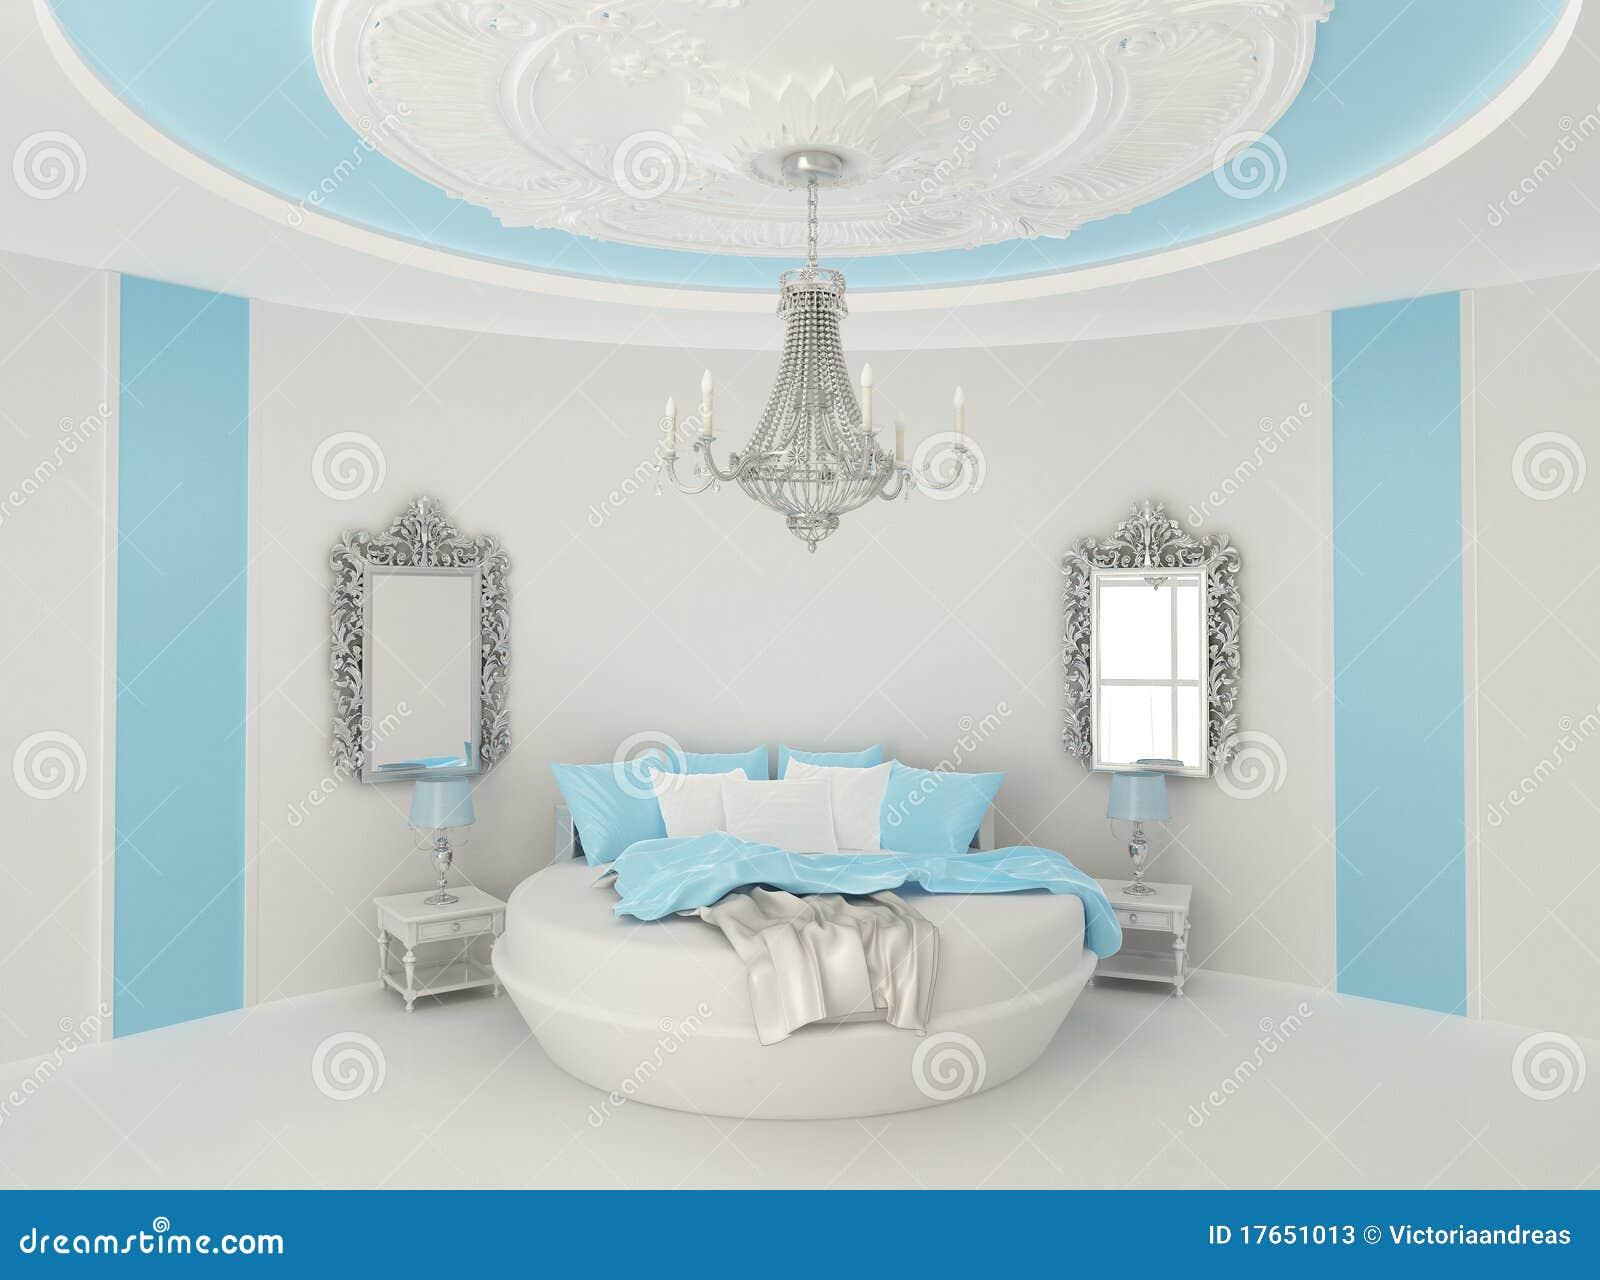 rundes bett im barocken innenraum stock abbildung bild 17651013. Black Bedroom Furniture Sets. Home Design Ideas